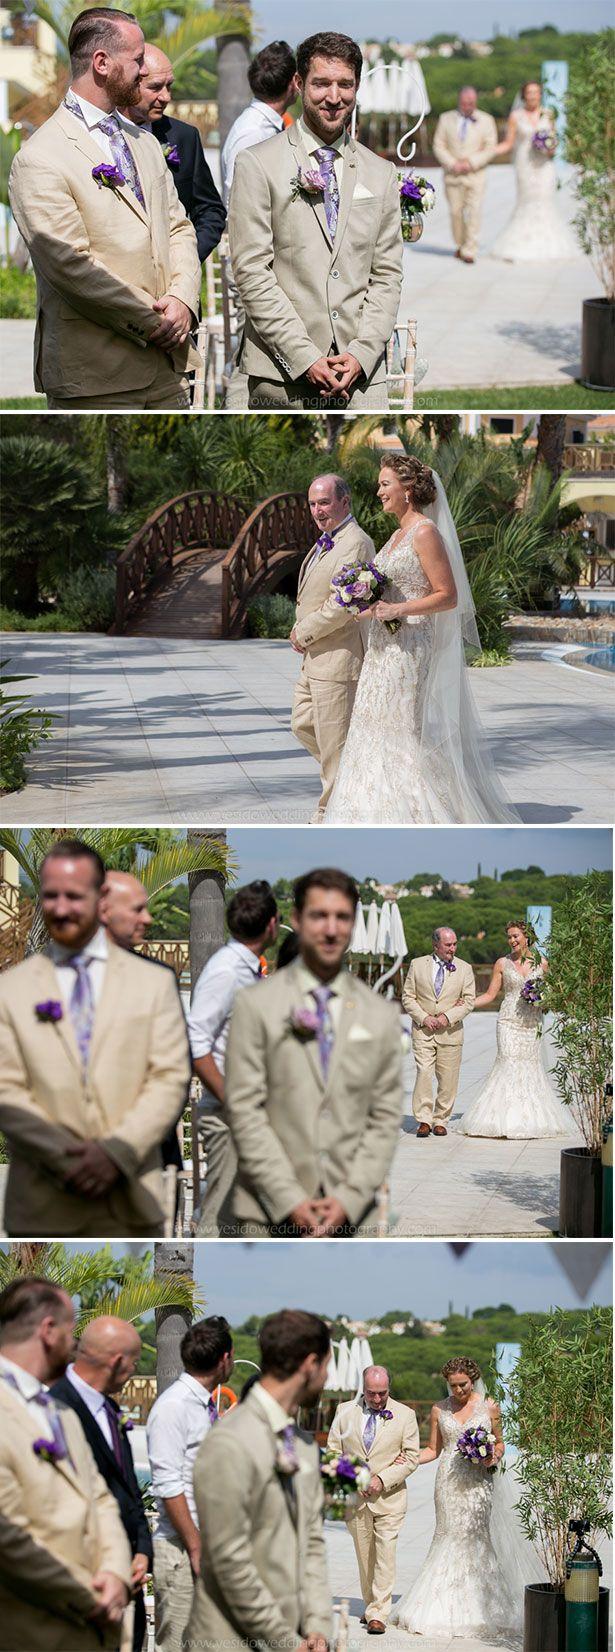 Wedding ceremoyn at Monte Da Quinta resort in Almancil, Portugal | Marina and Gary's lavender real wedding | Yes I do! Algarve Wedding Photography | Confetti.fo.uk